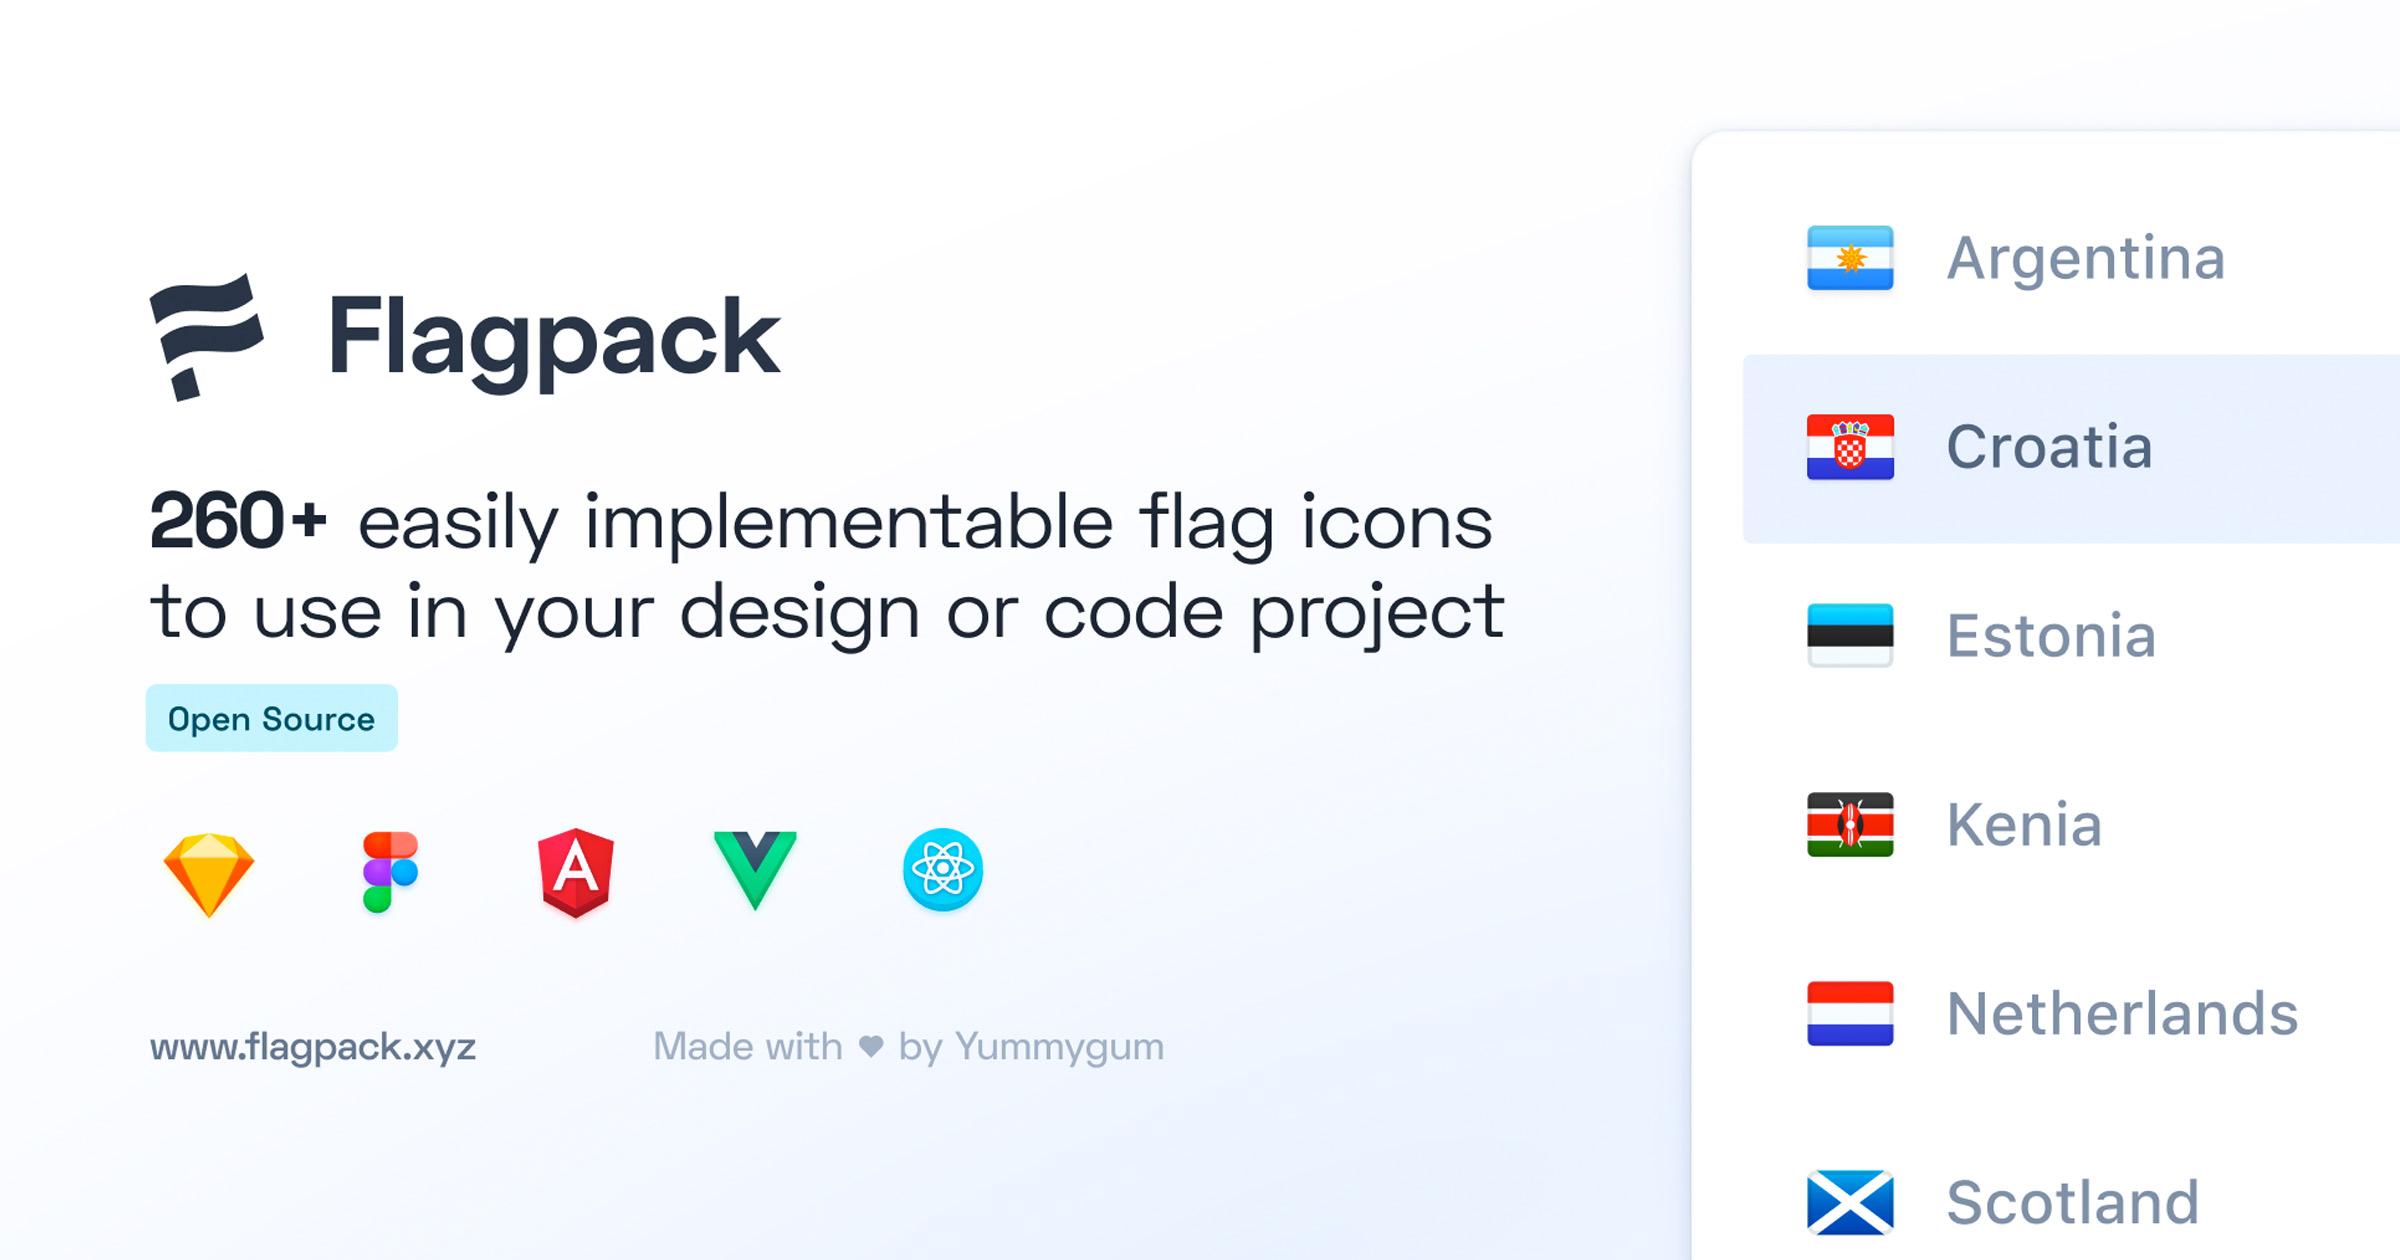 Flagpack